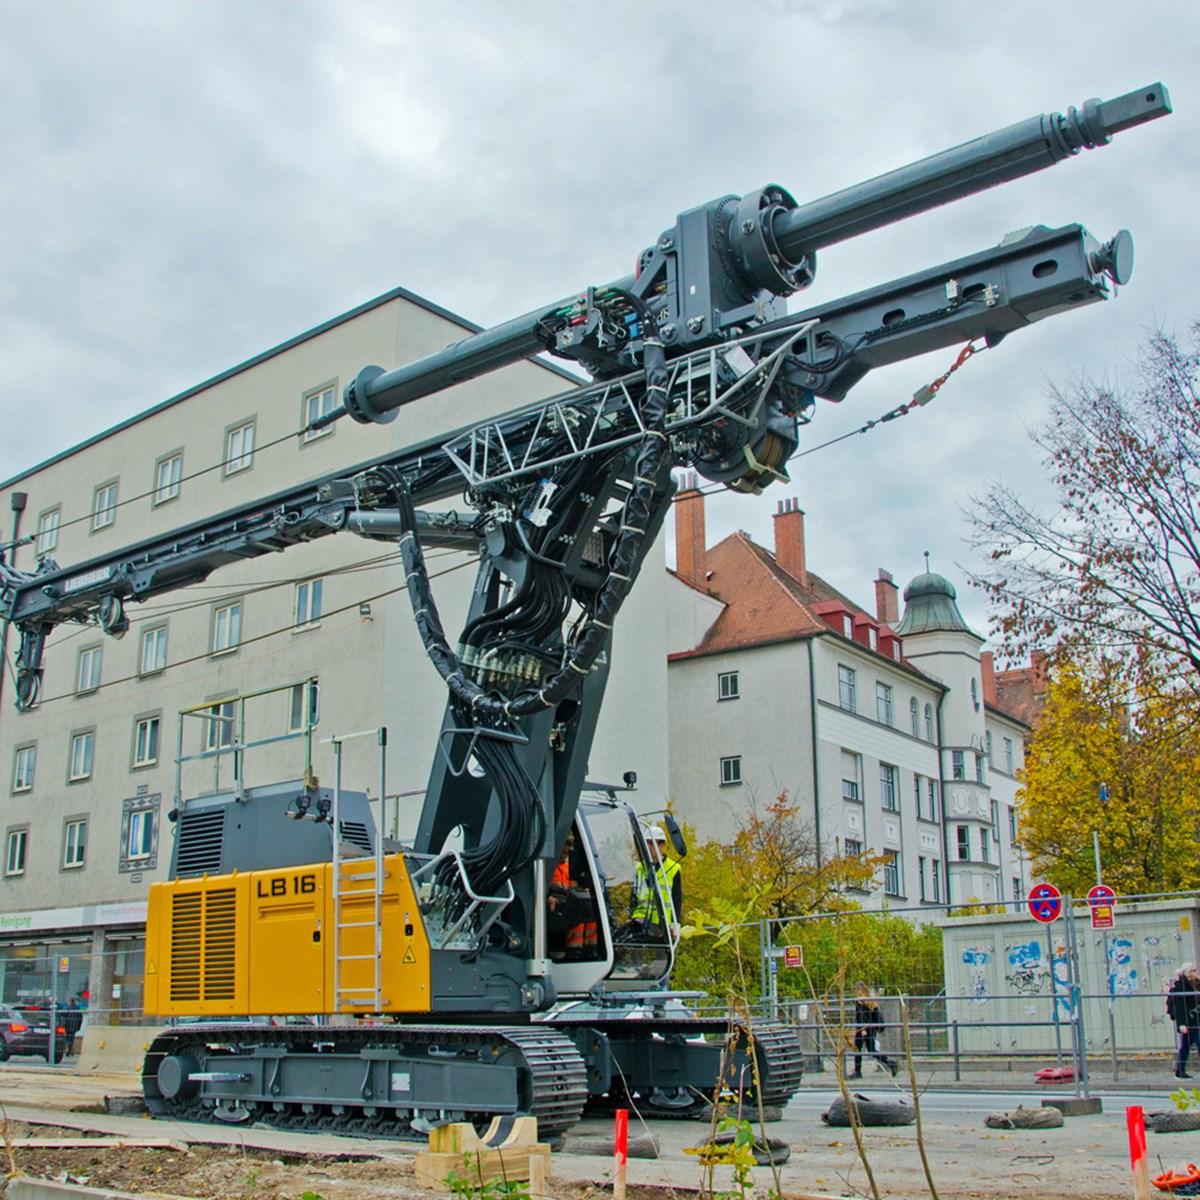 liebherr-bat-180-rotary-drive-bohrantrieb-for-lb-16-drilling-rig-kelly-drill-1.jpg